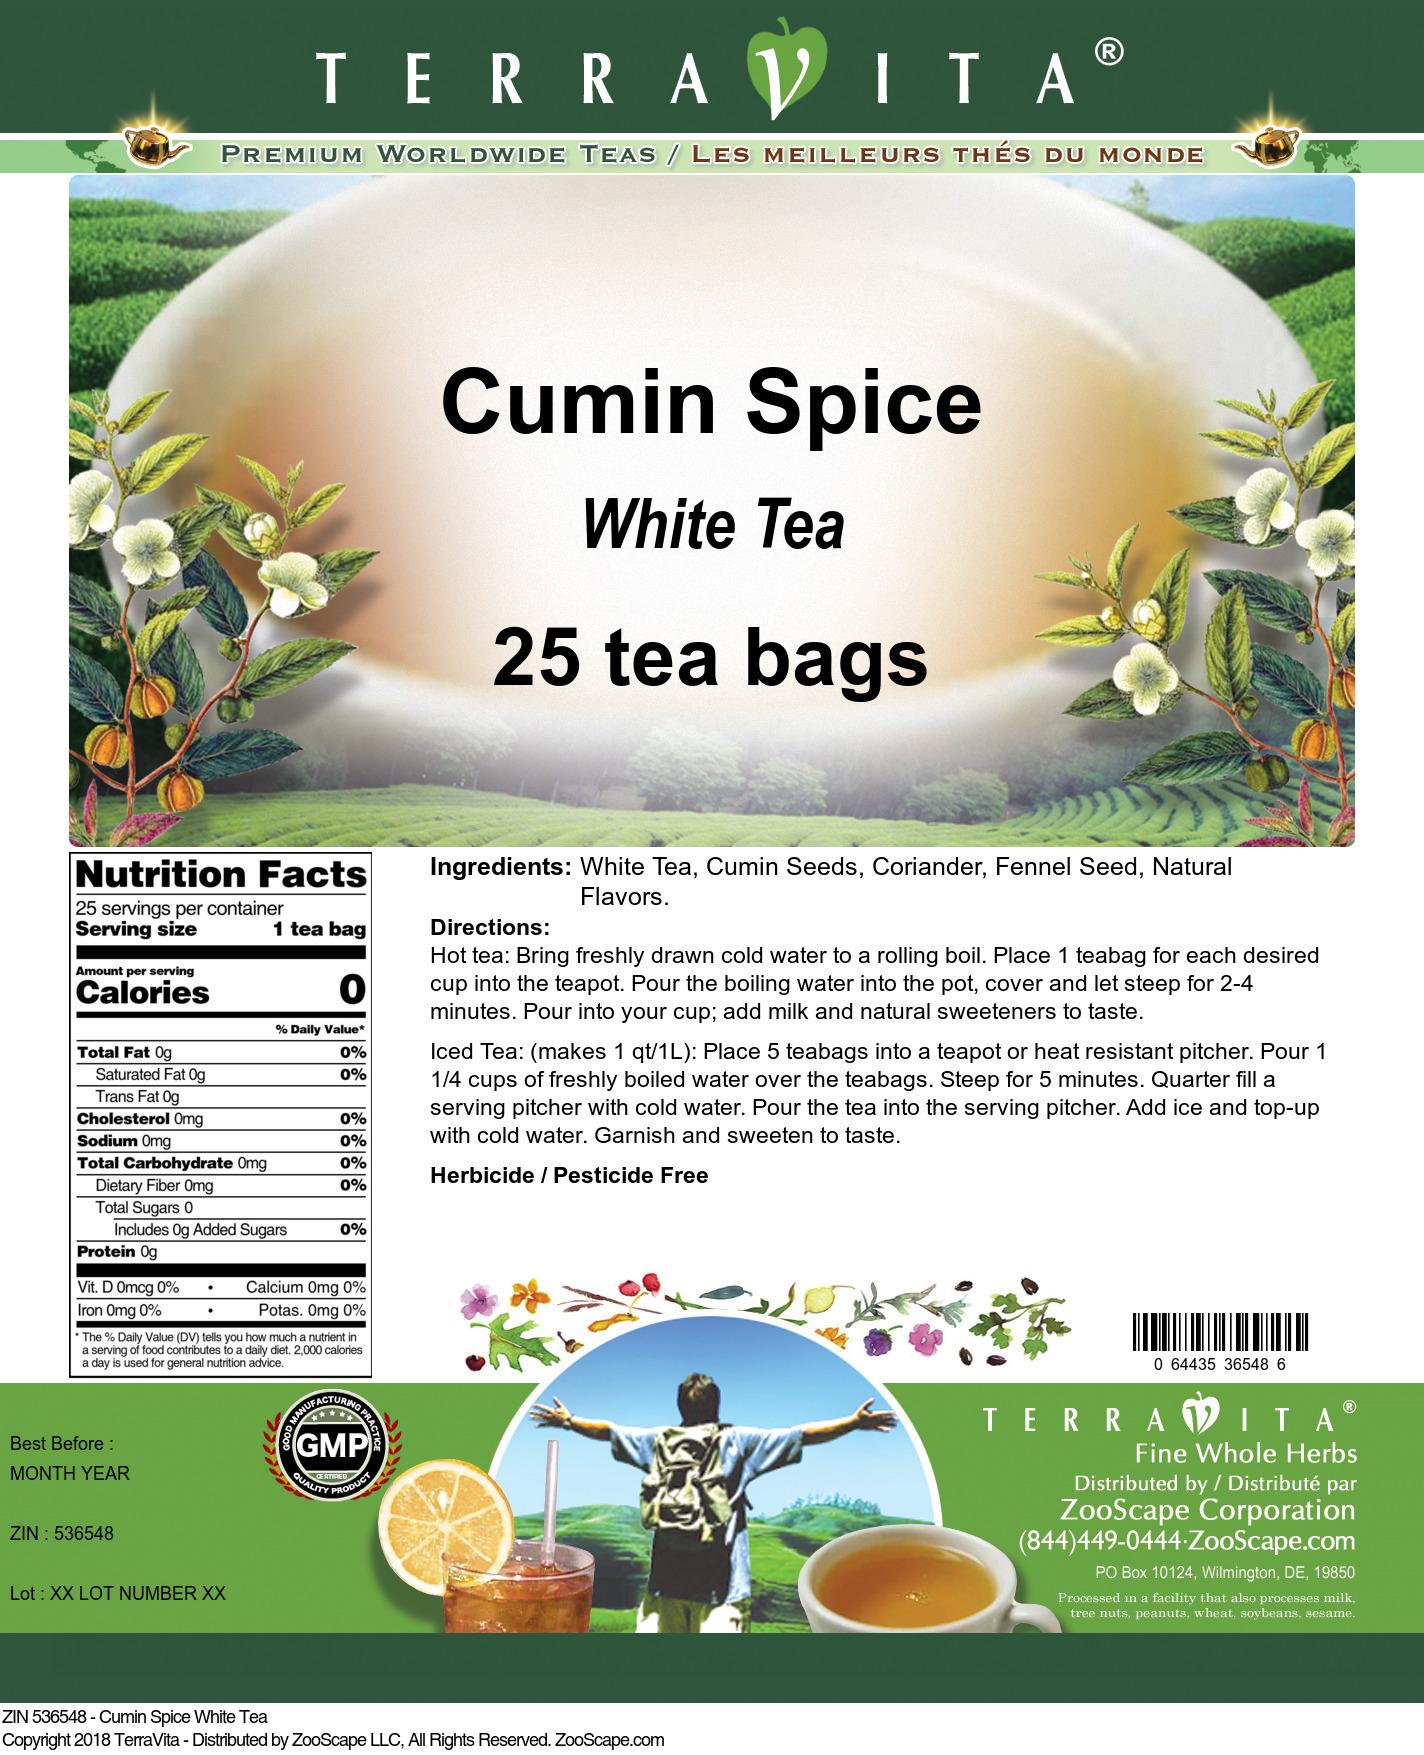 Cumin Spice White Tea